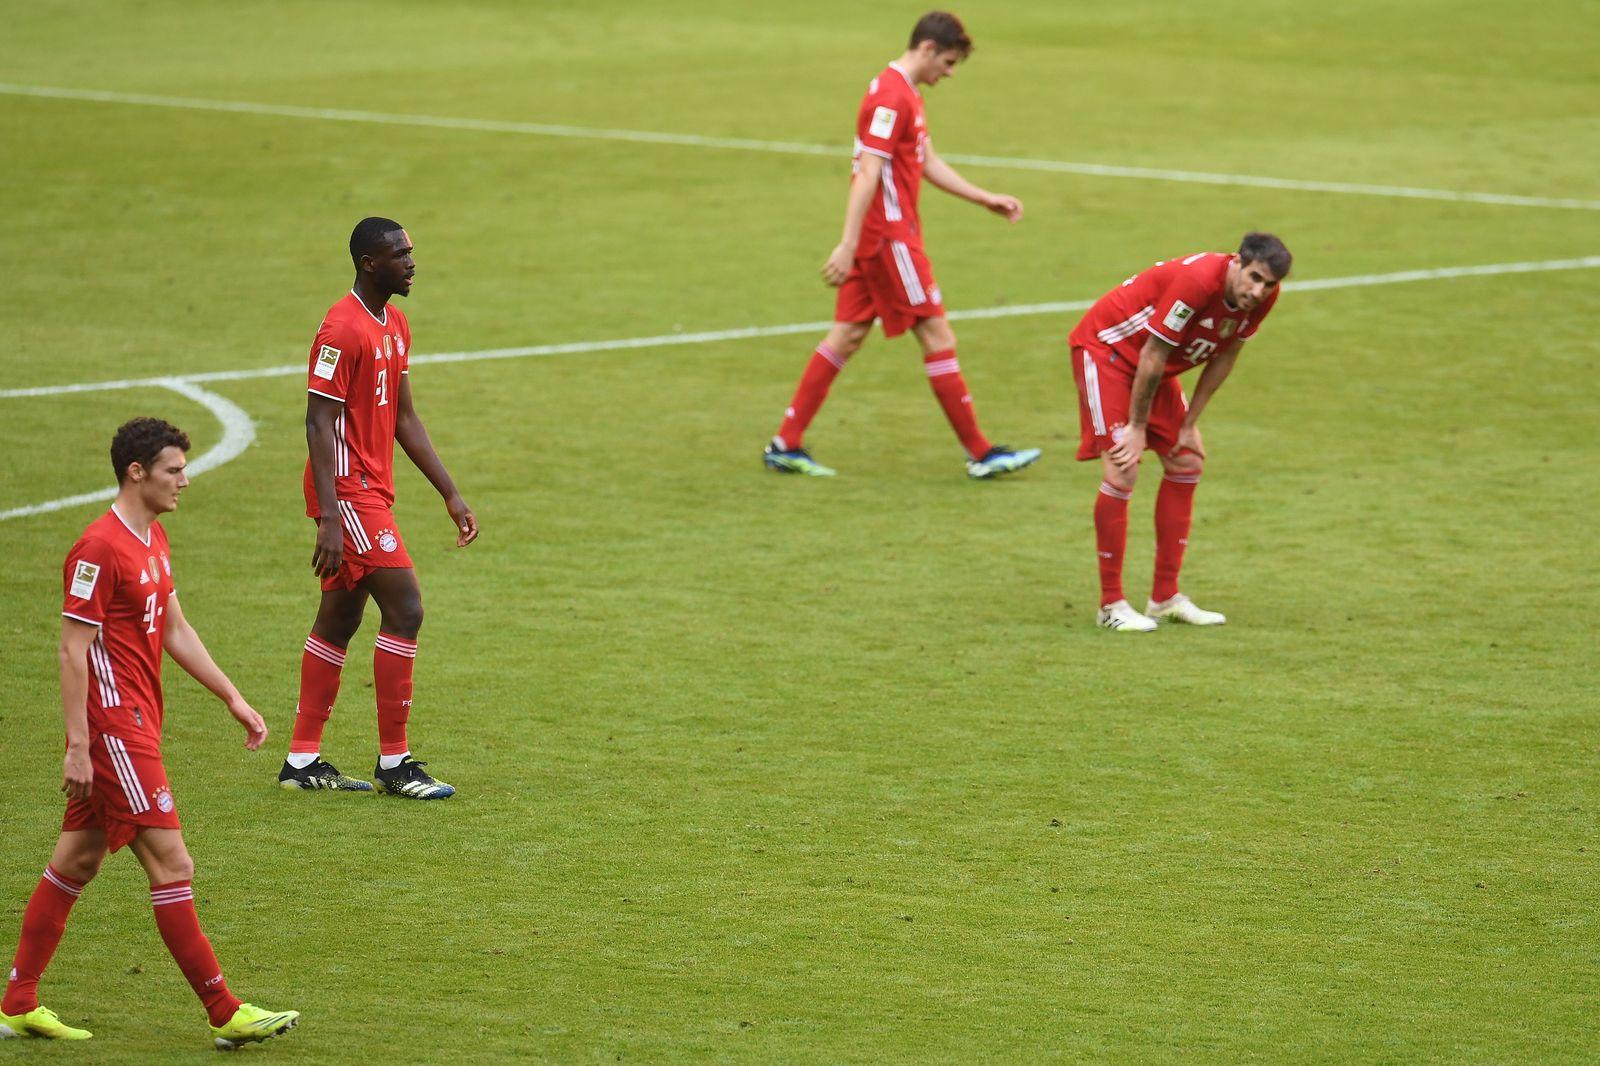 FC Bayern vs Union Berlin